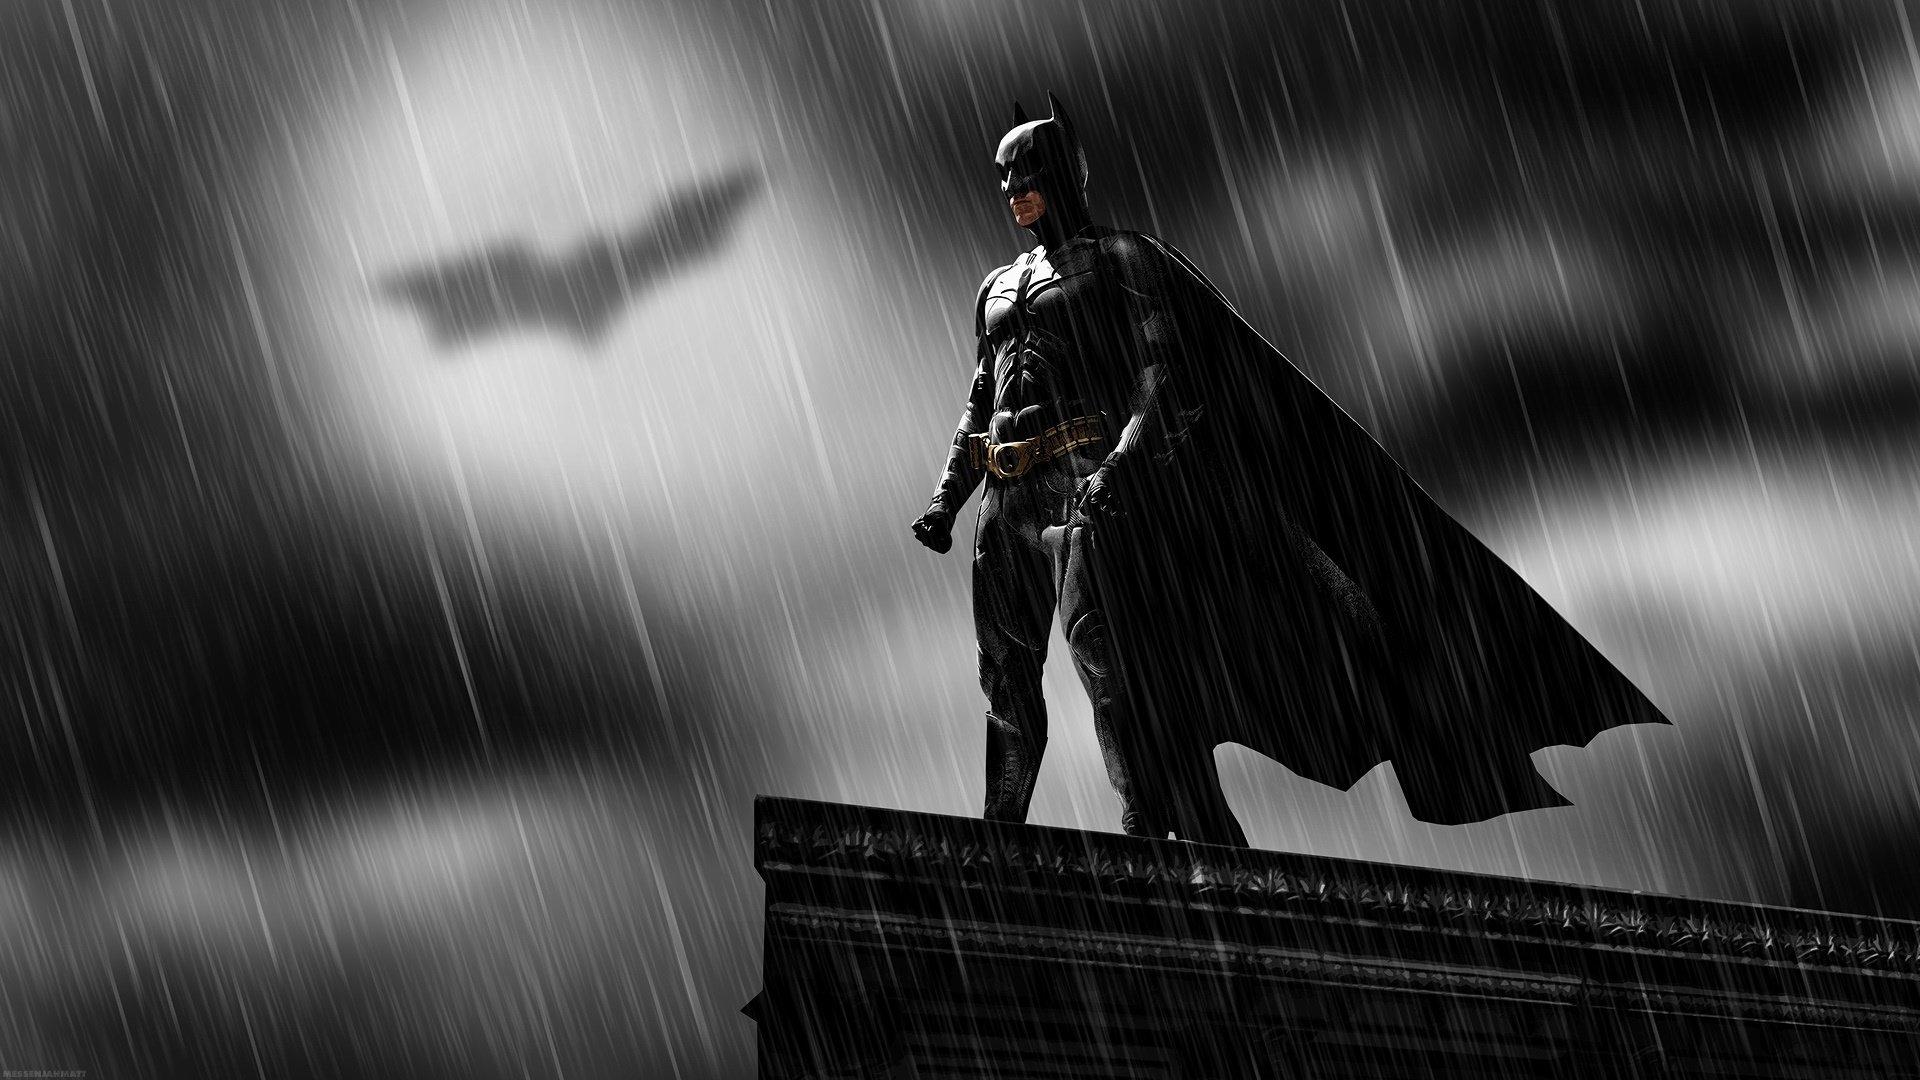 Download Full Hd 1080p Superhero Computer Wallpaper ID161261 For Free